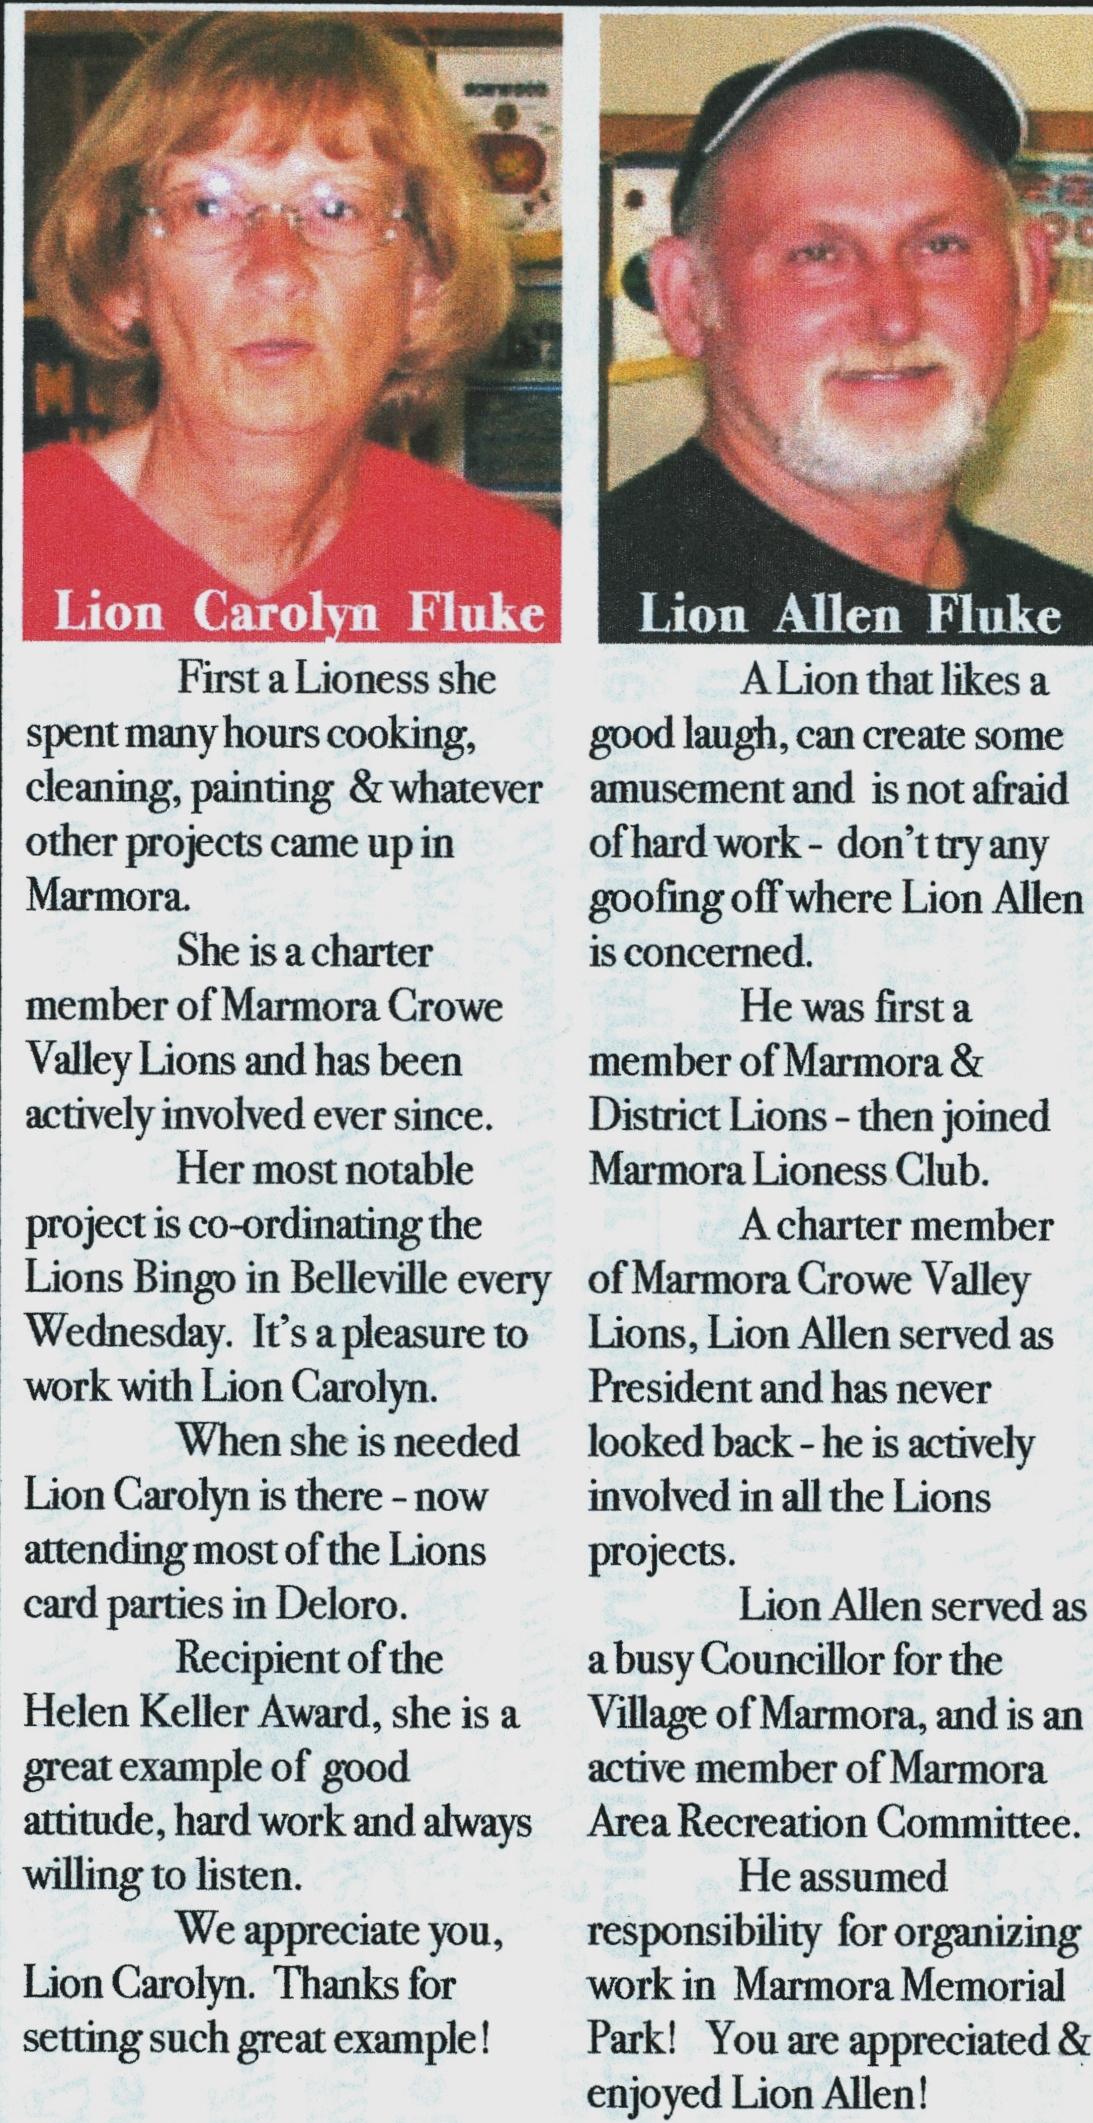 Lions Carolyn and Allen Fluke.jpg